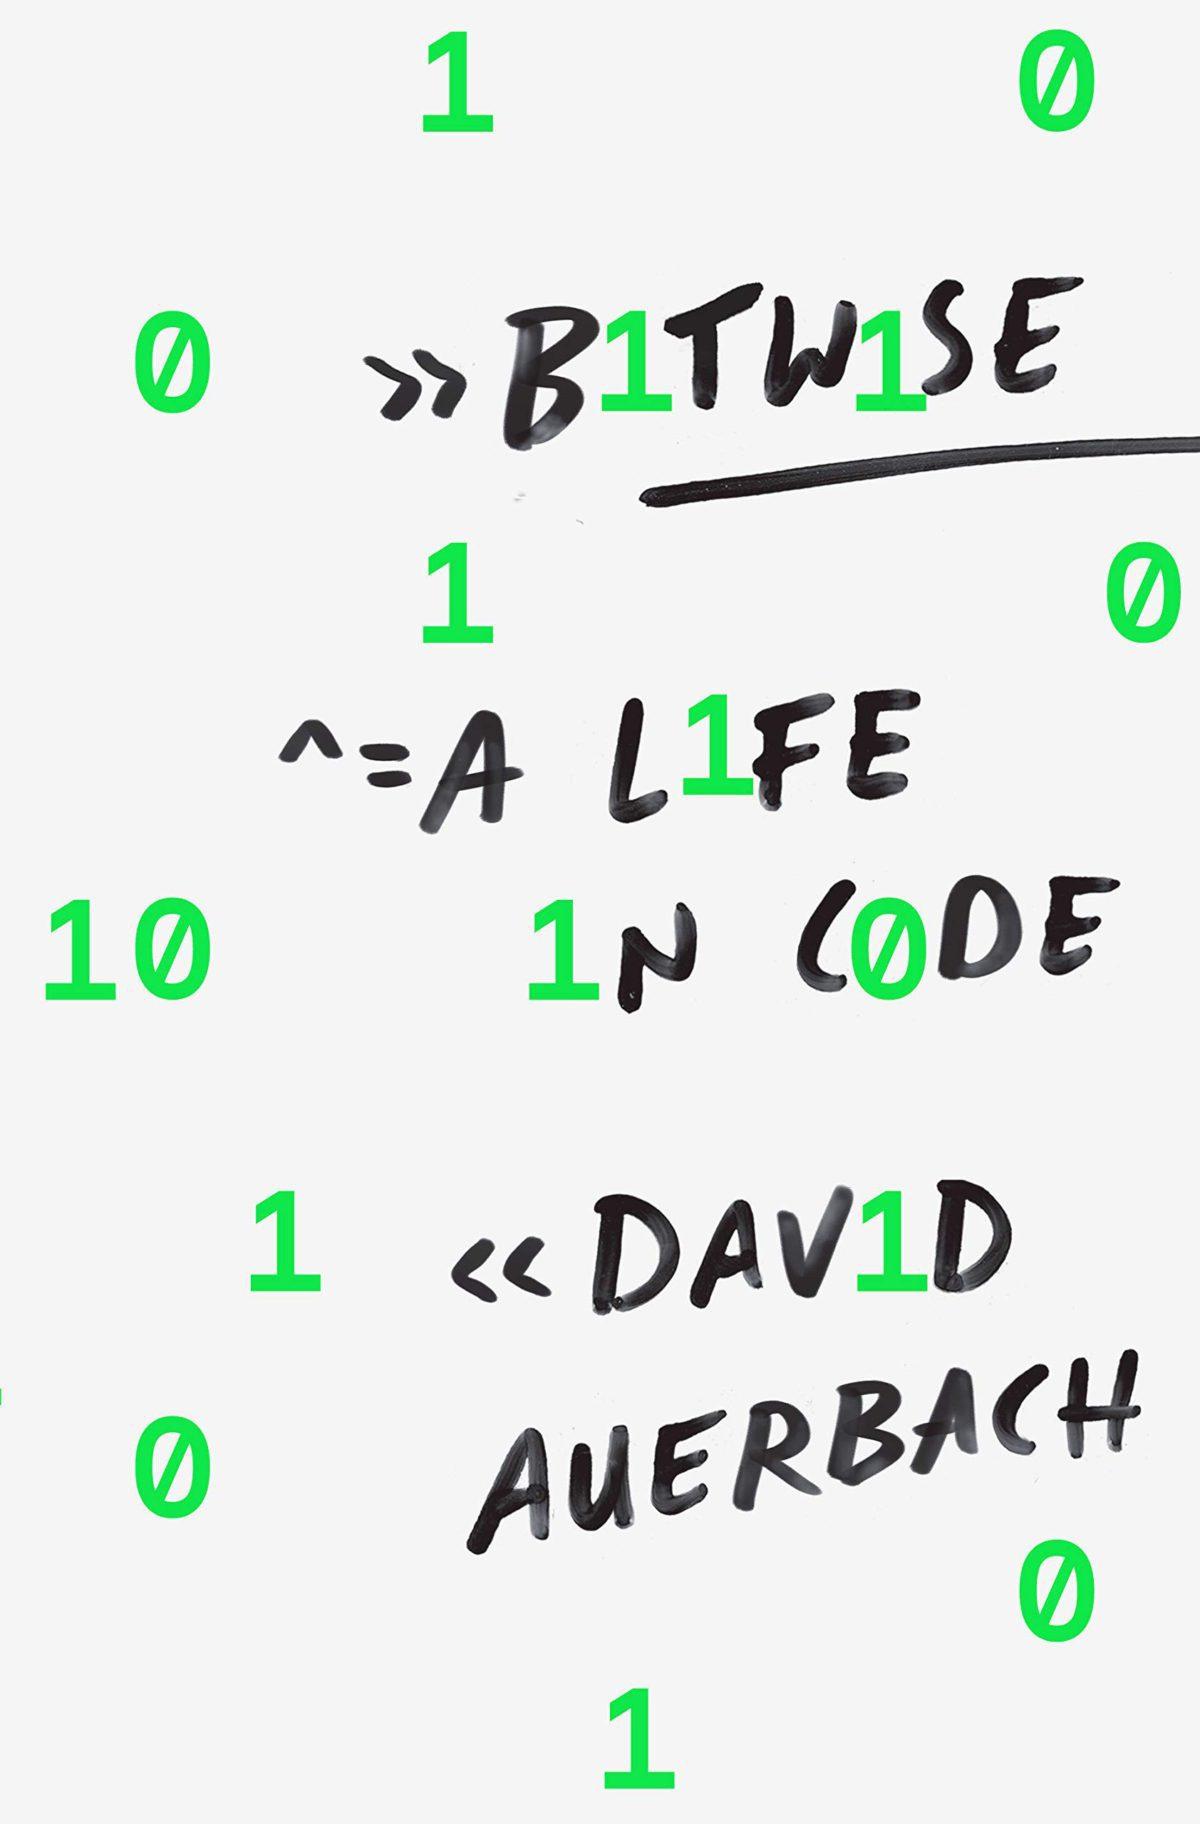 Book_bitwise-design-tyler-comrie.jpg